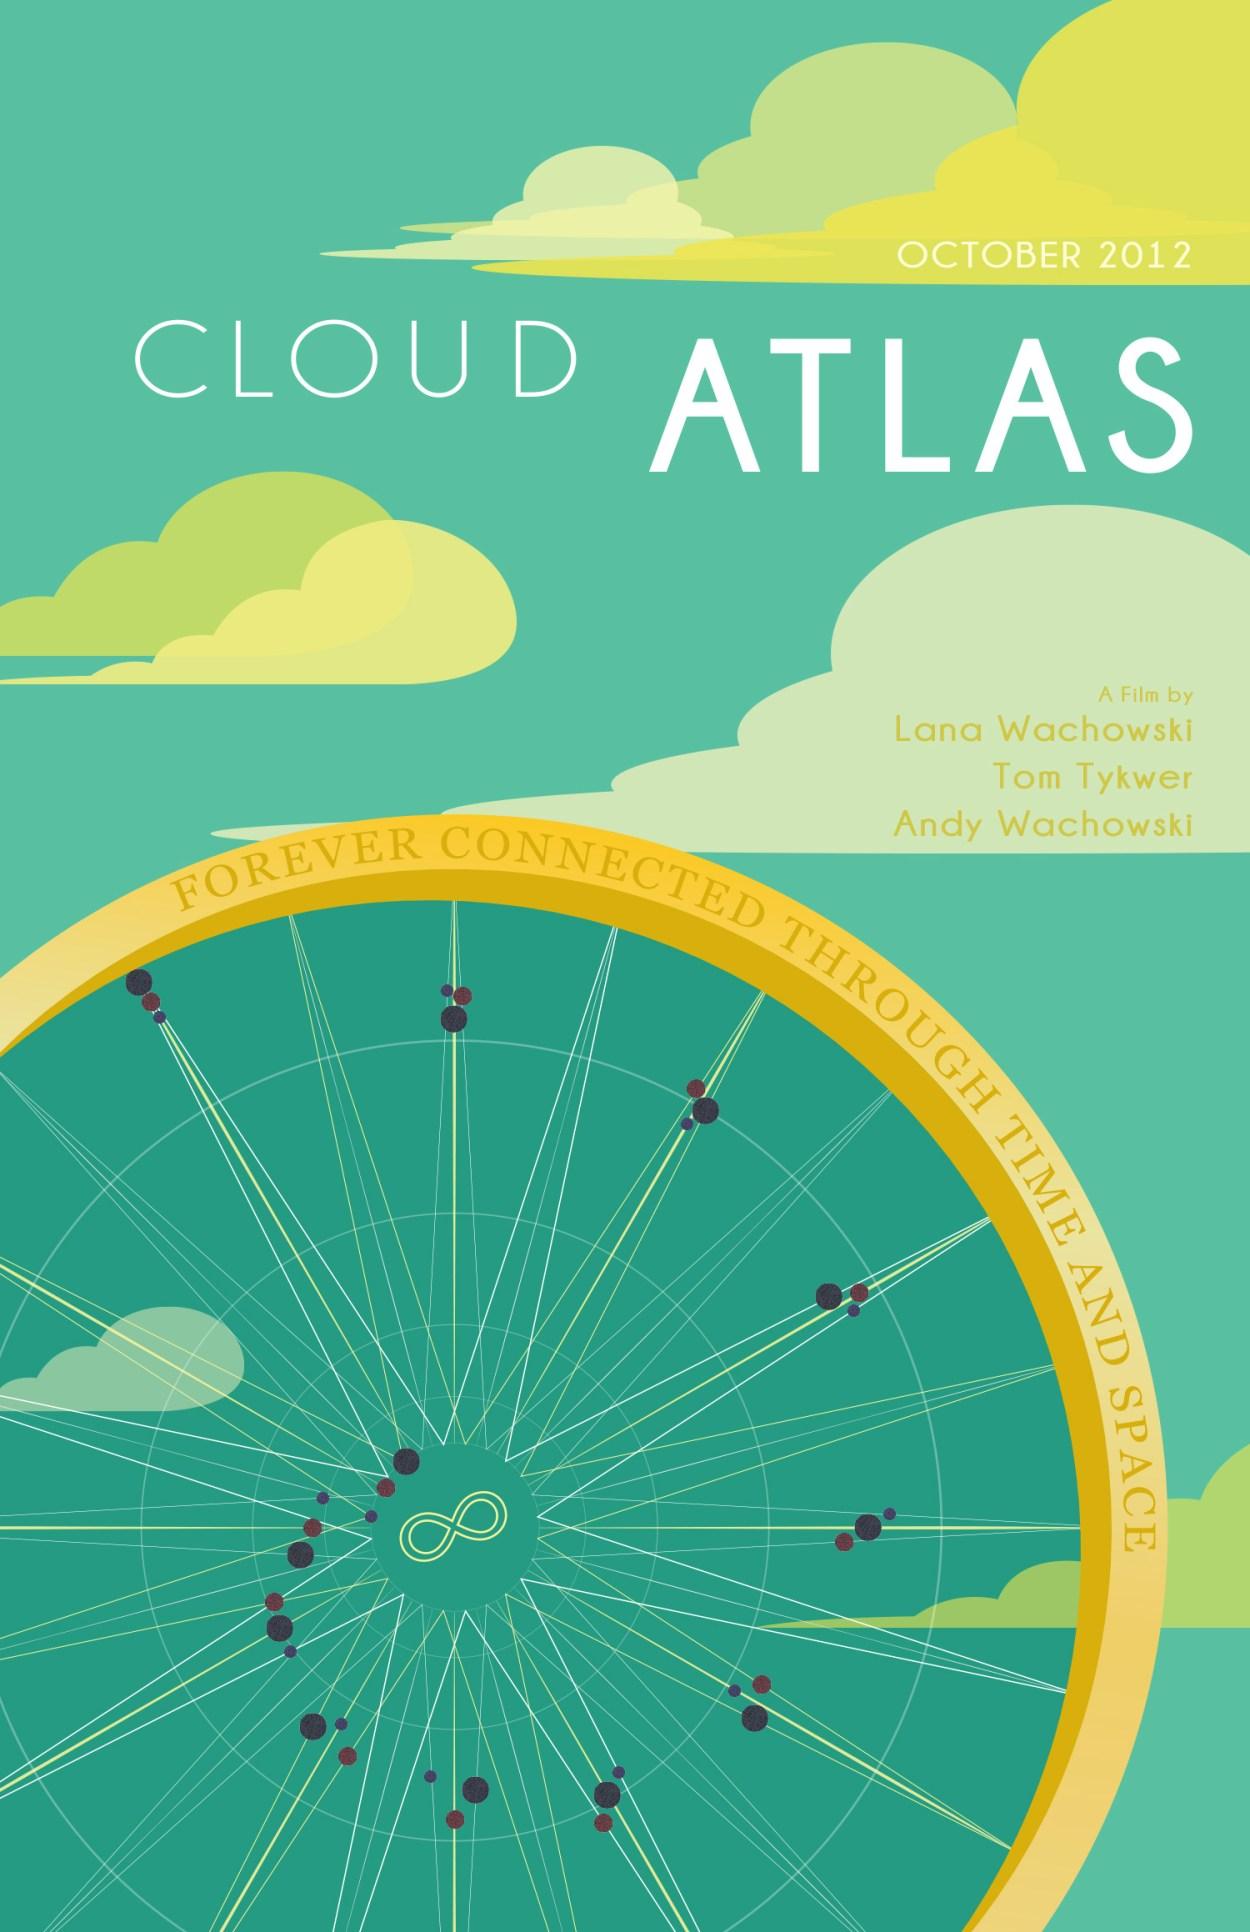 Cloud-Atlas_1.jpg?fit=1500%2C2318&ssl=1